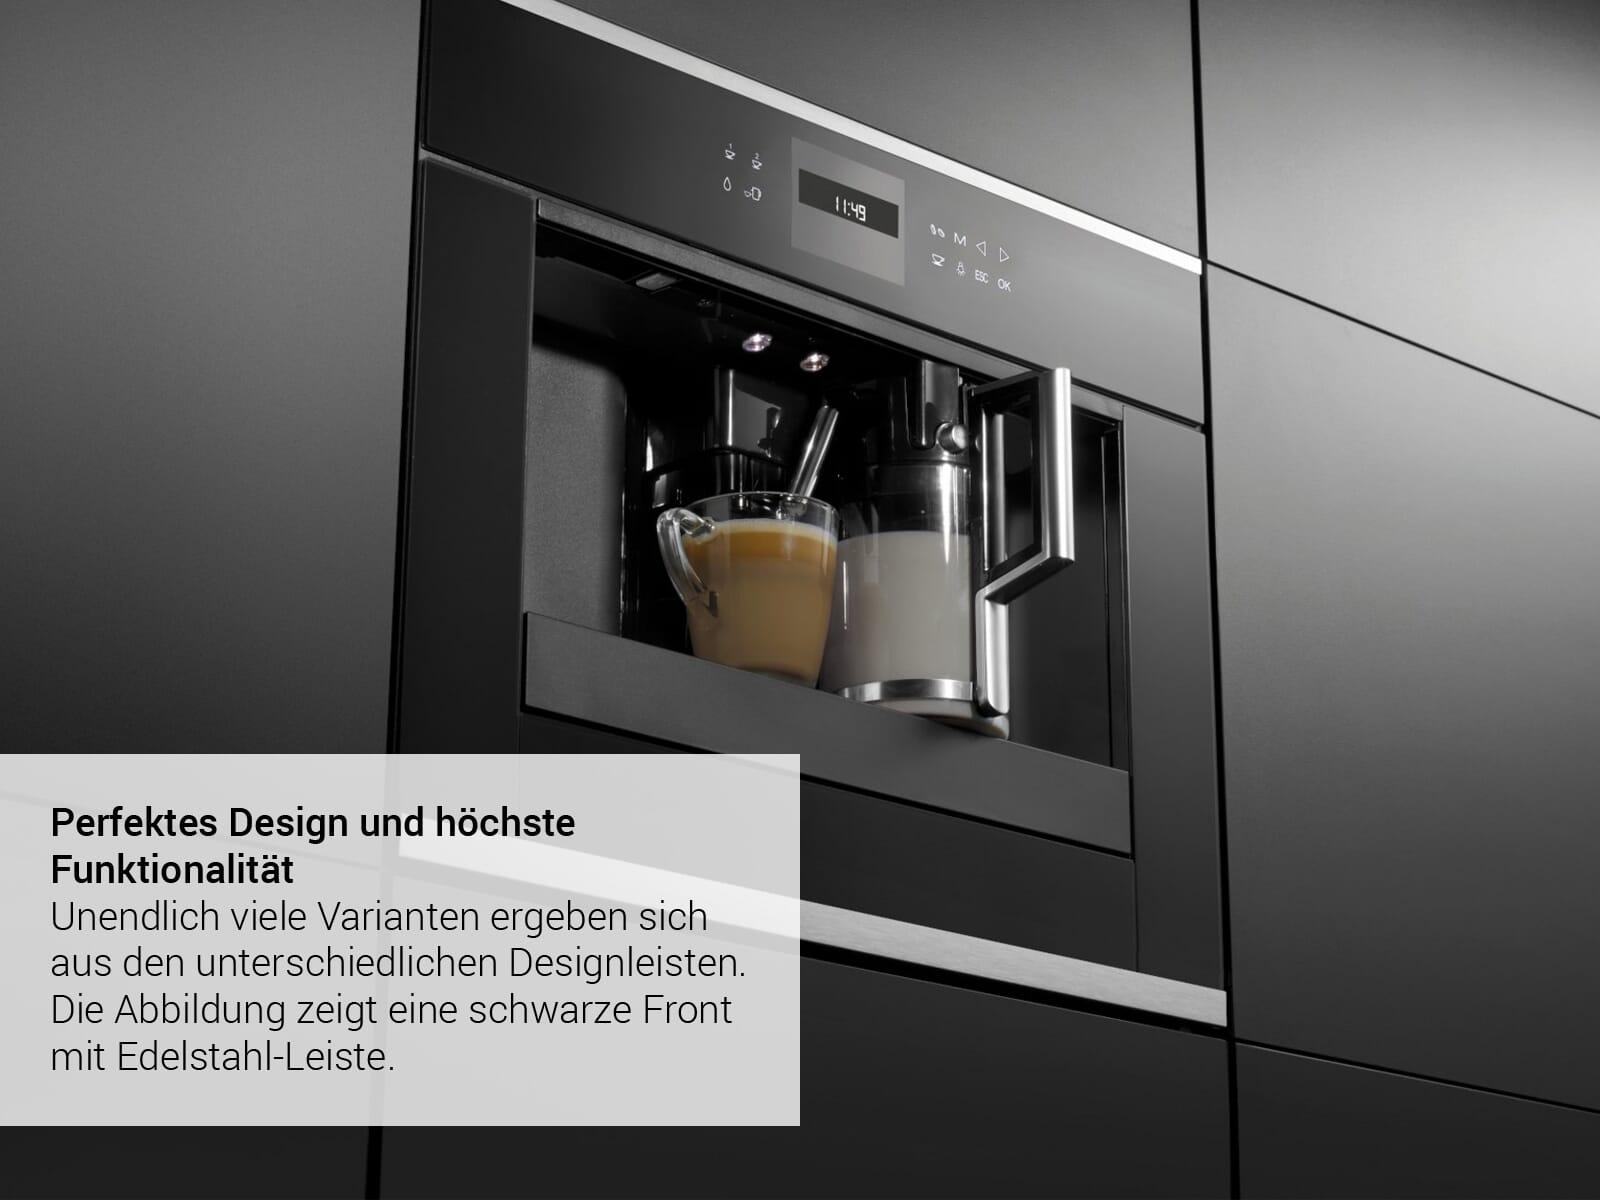 Küppersbusch CKV 6550.0 G2 K-Series. 5 Einbau-Espresso-/Kaffeevollautomat Grau/Black Chrome